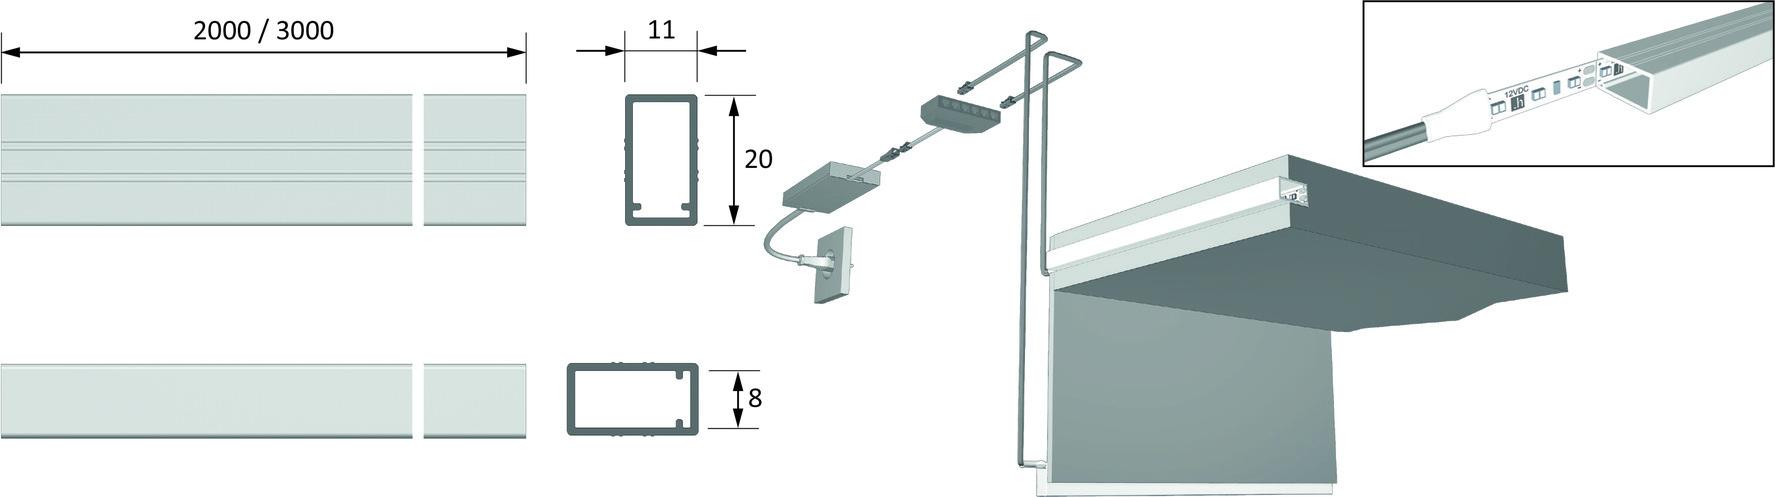 LED Einbauprofile HALEMEIER ChannelLine K